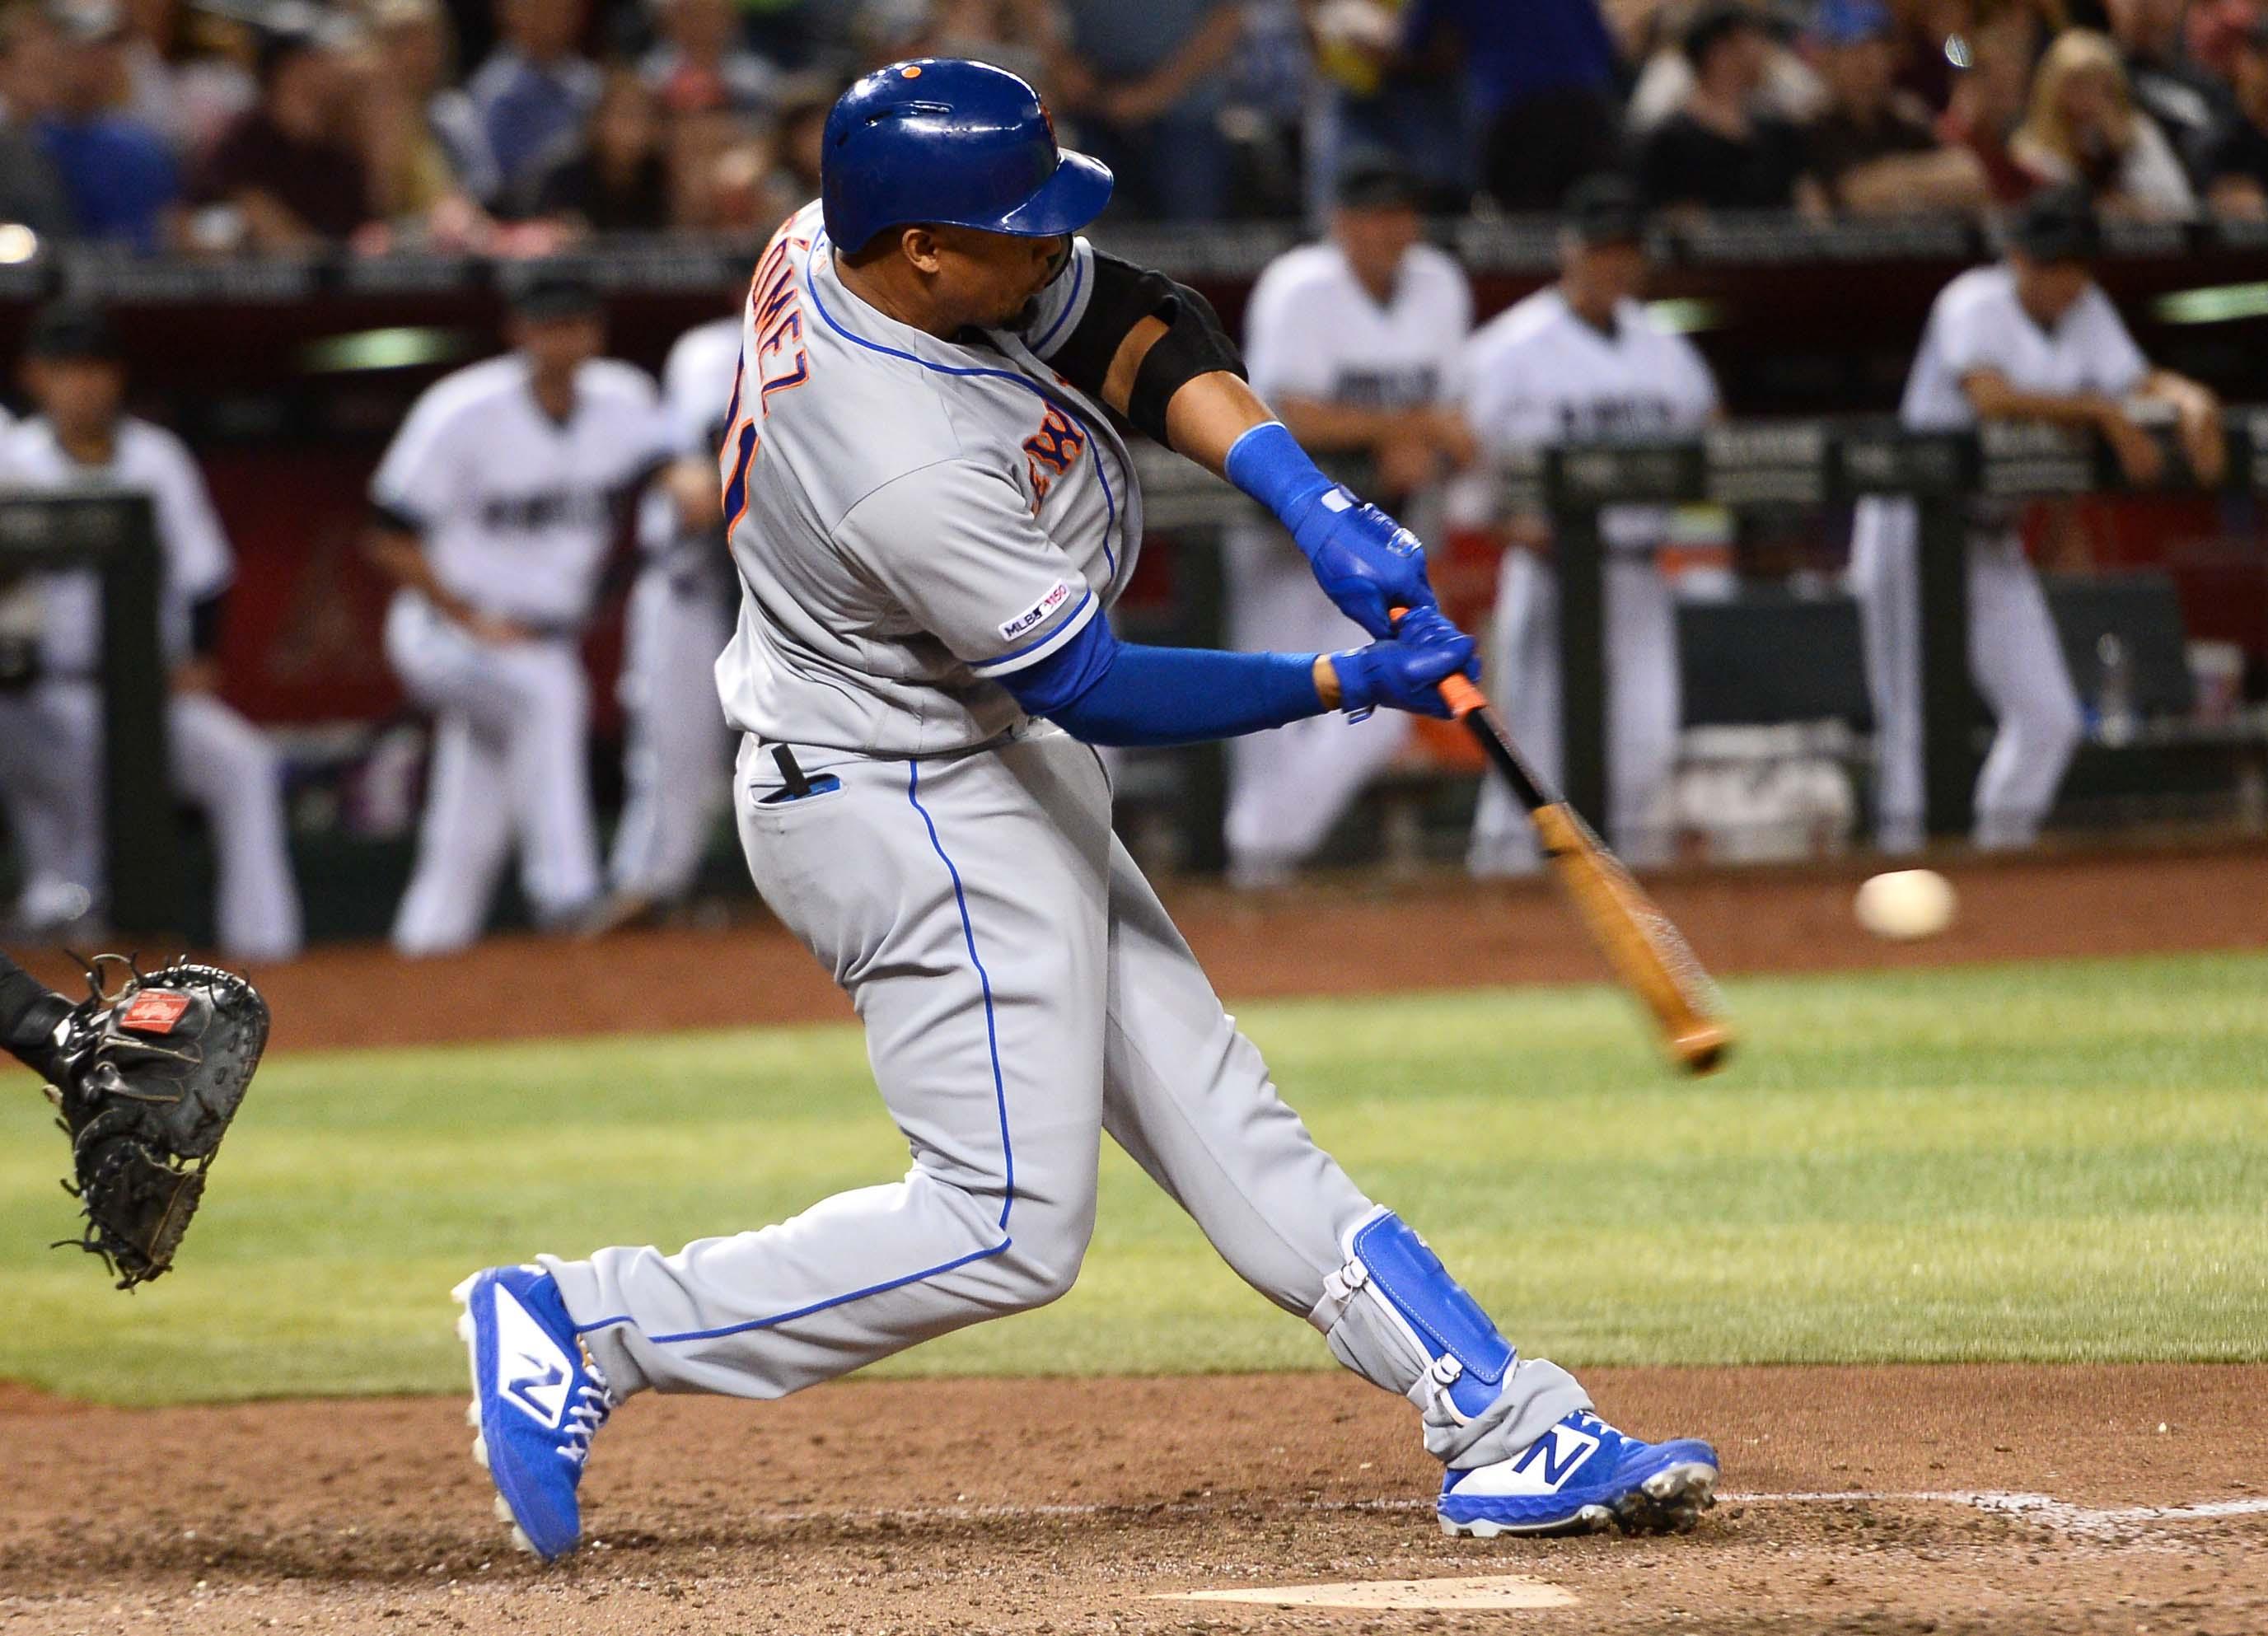 6/1/19 Game Preview: New York Mets at Arizona Diamondbacks